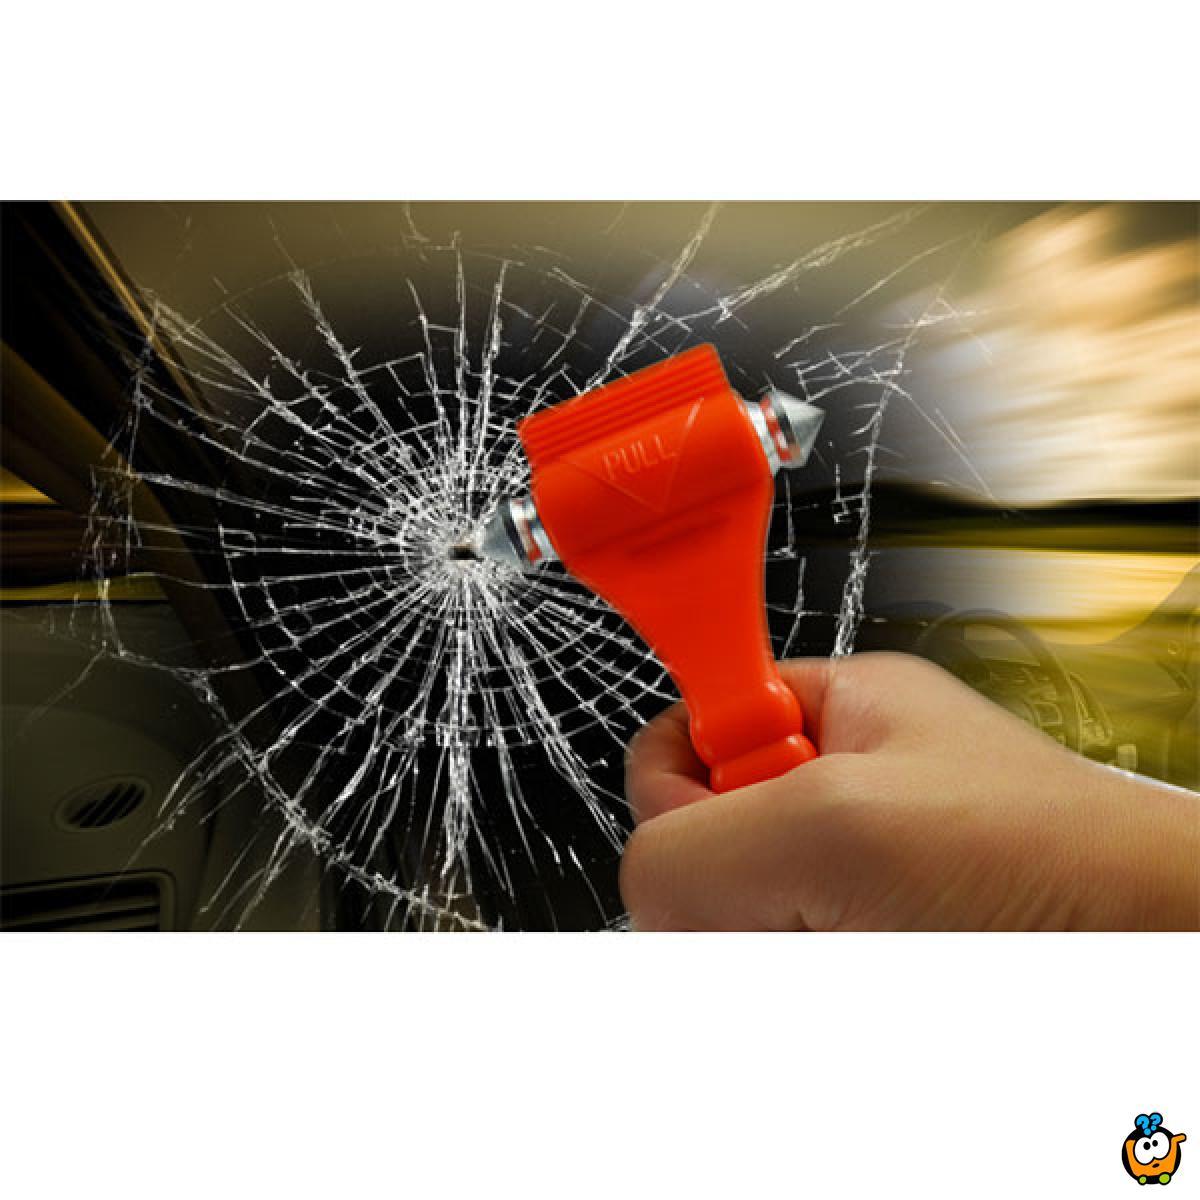 Emergency Hammer - SOS čekić za razbijanje stakla